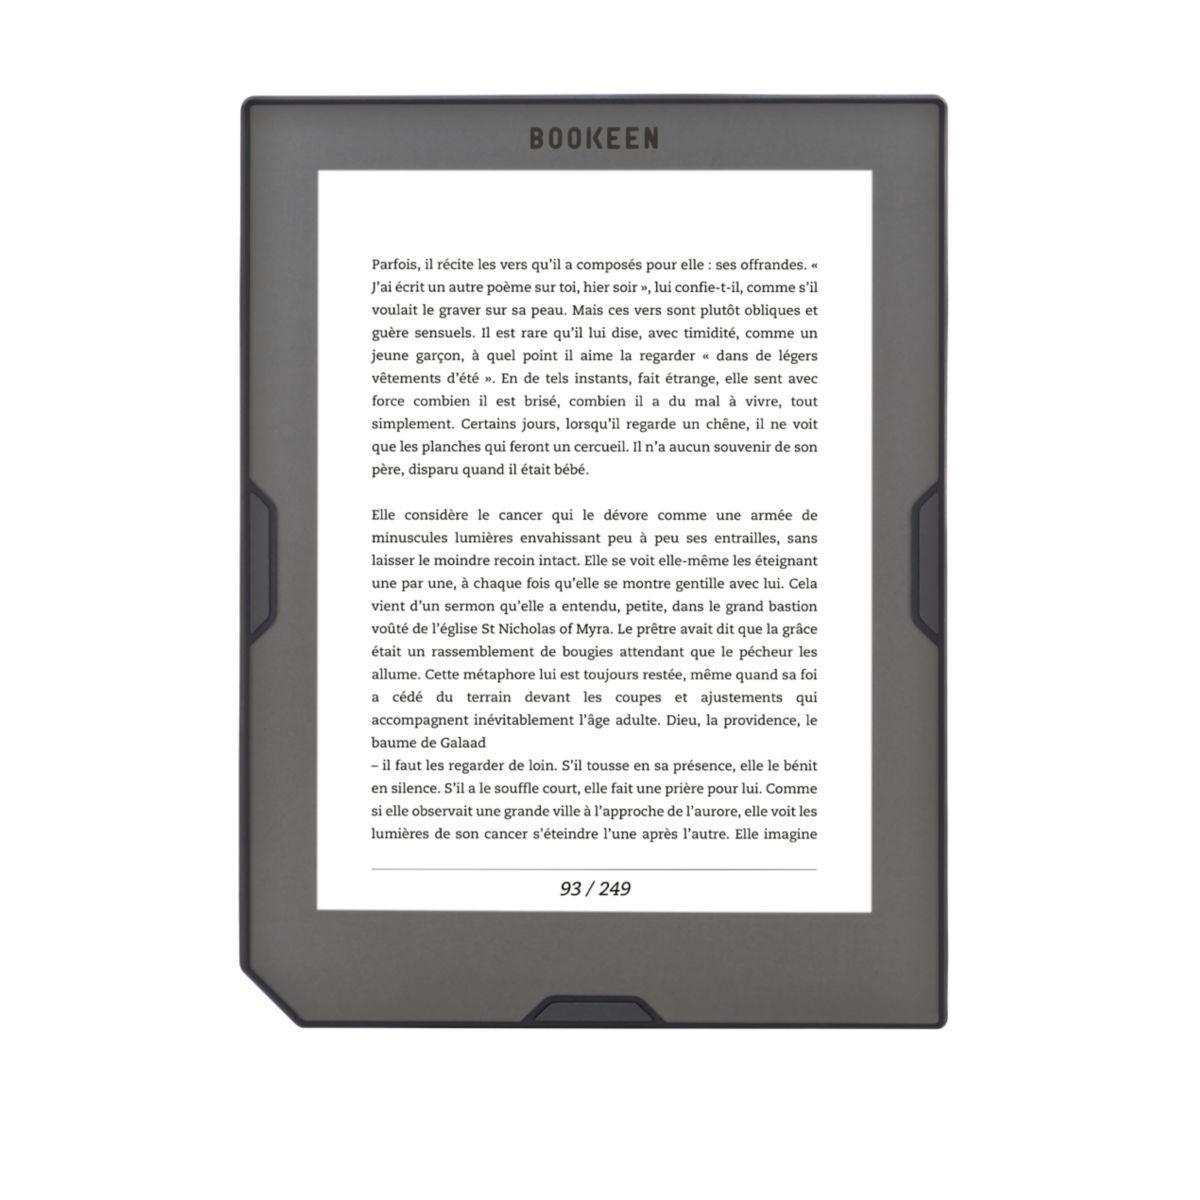 e-book BOOKEEN Cybook Muse HD (photo)